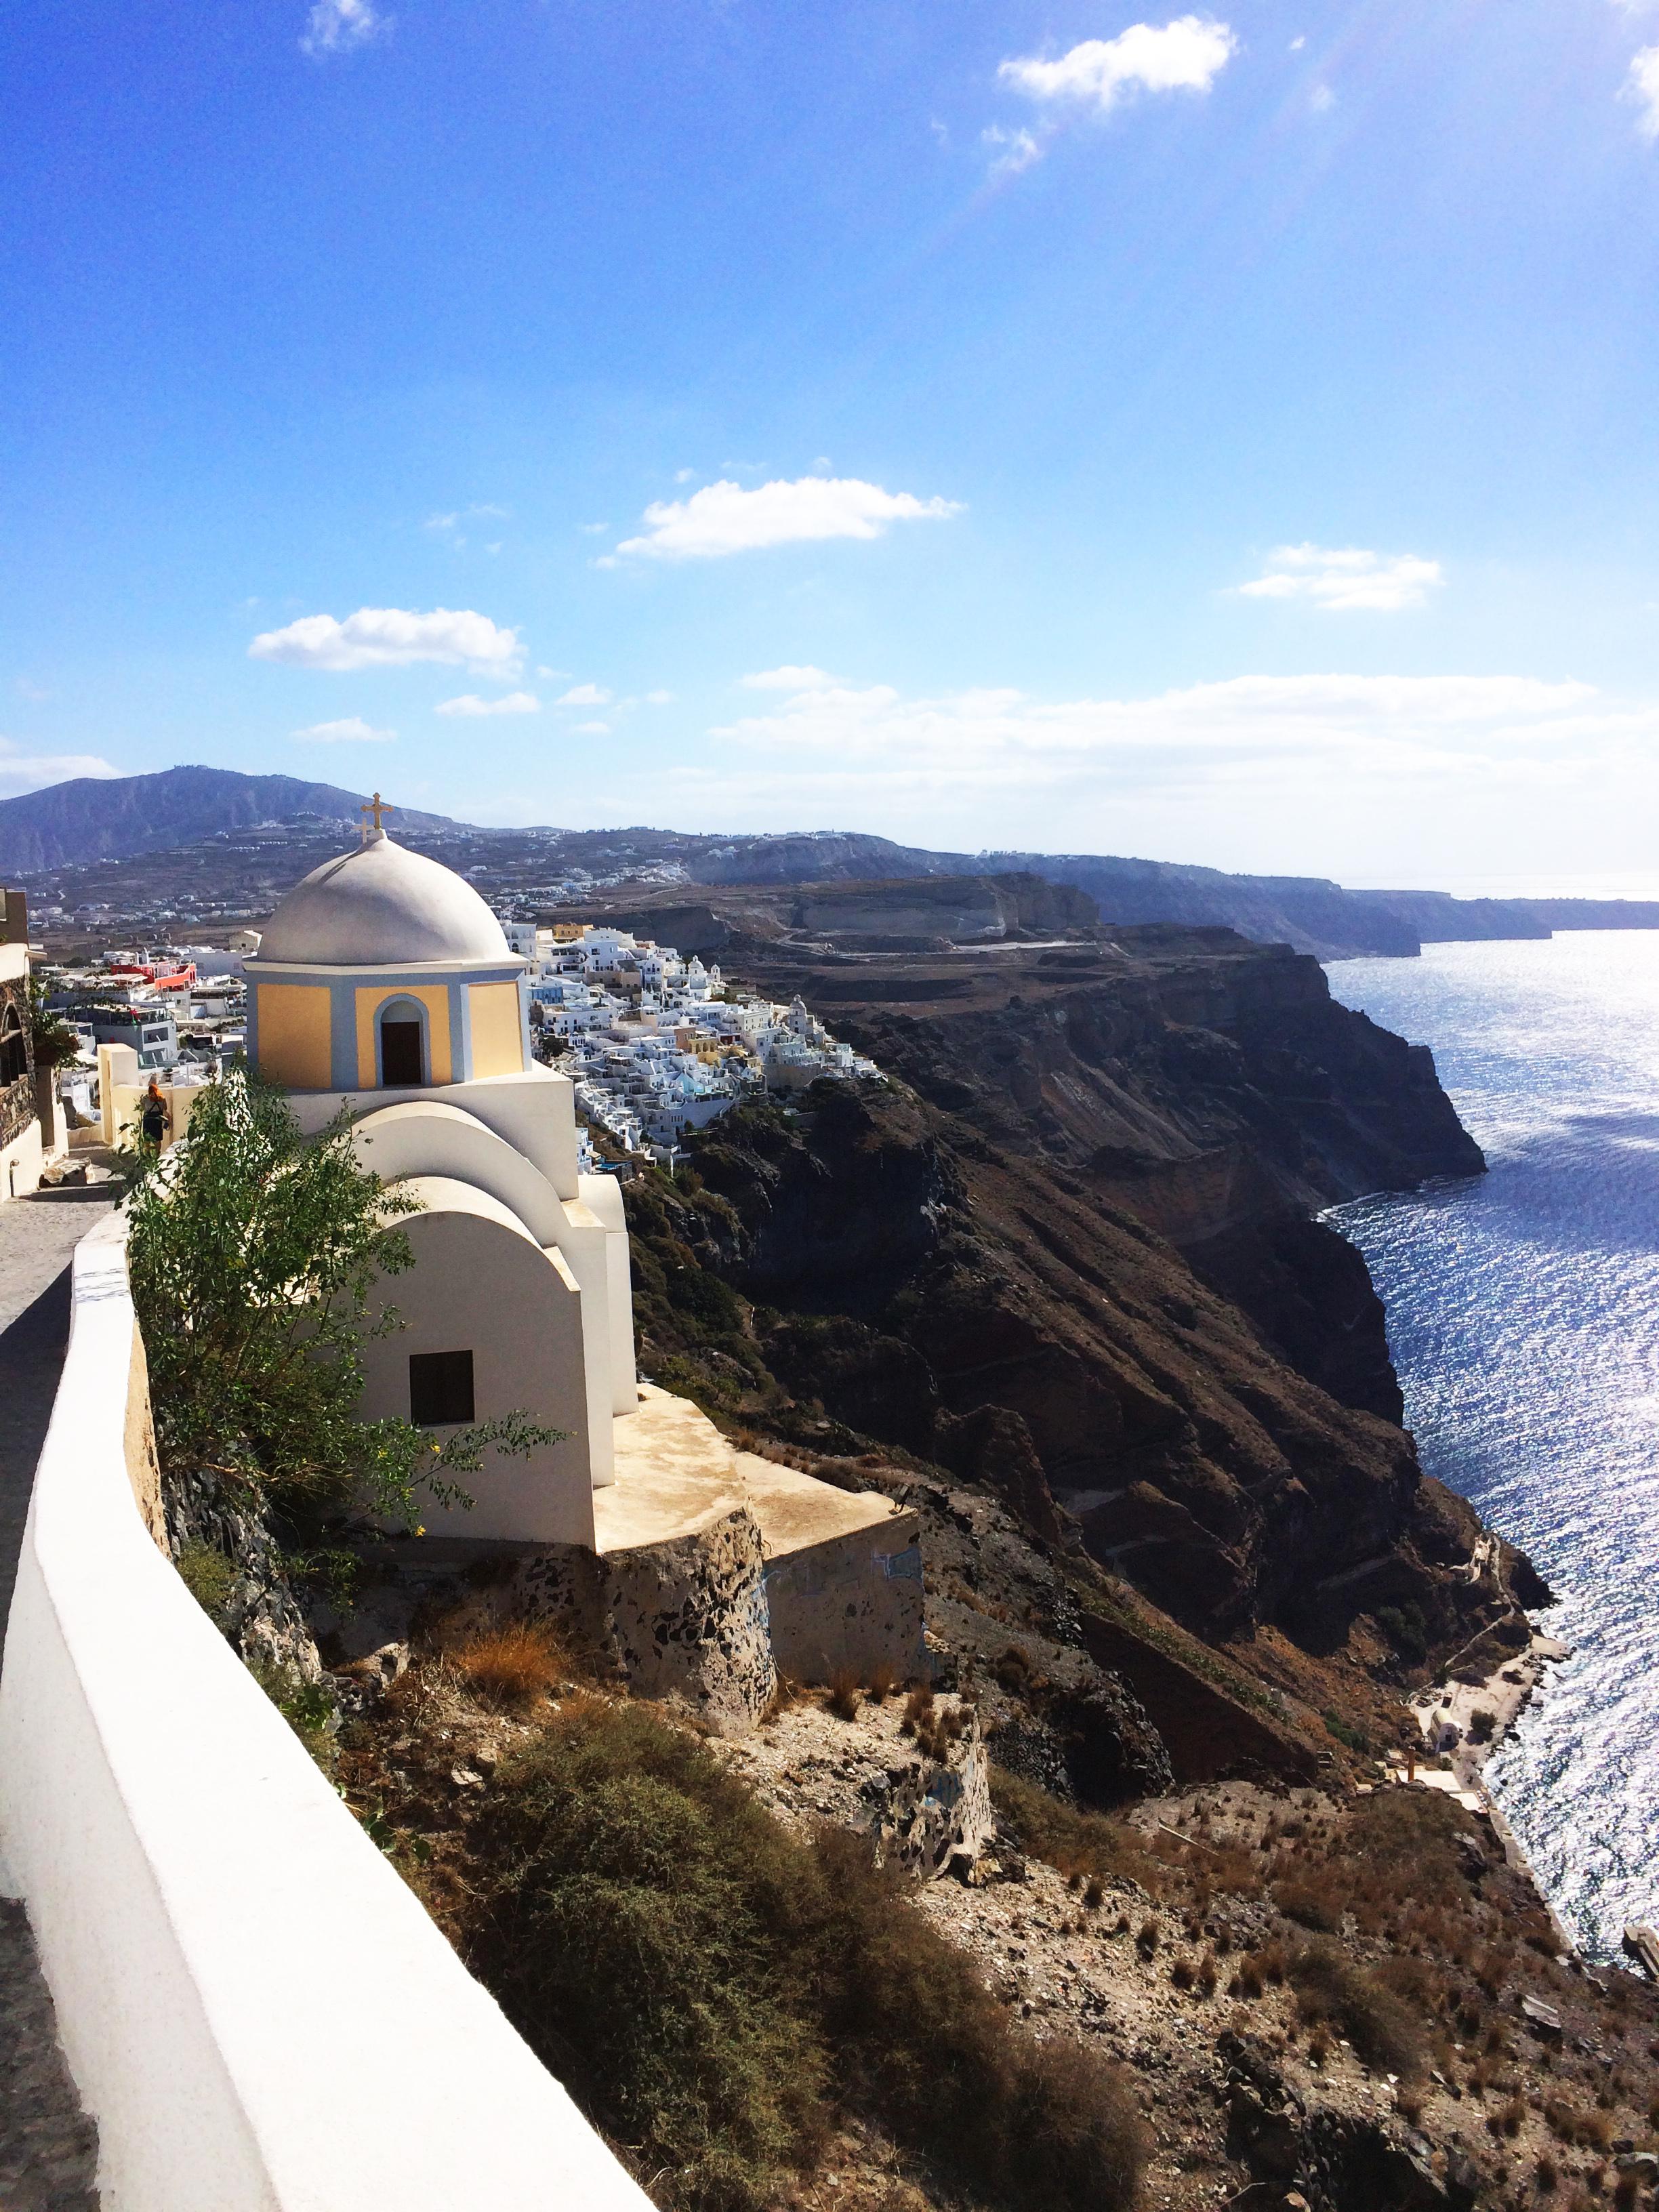 église Santorin Grèce 1